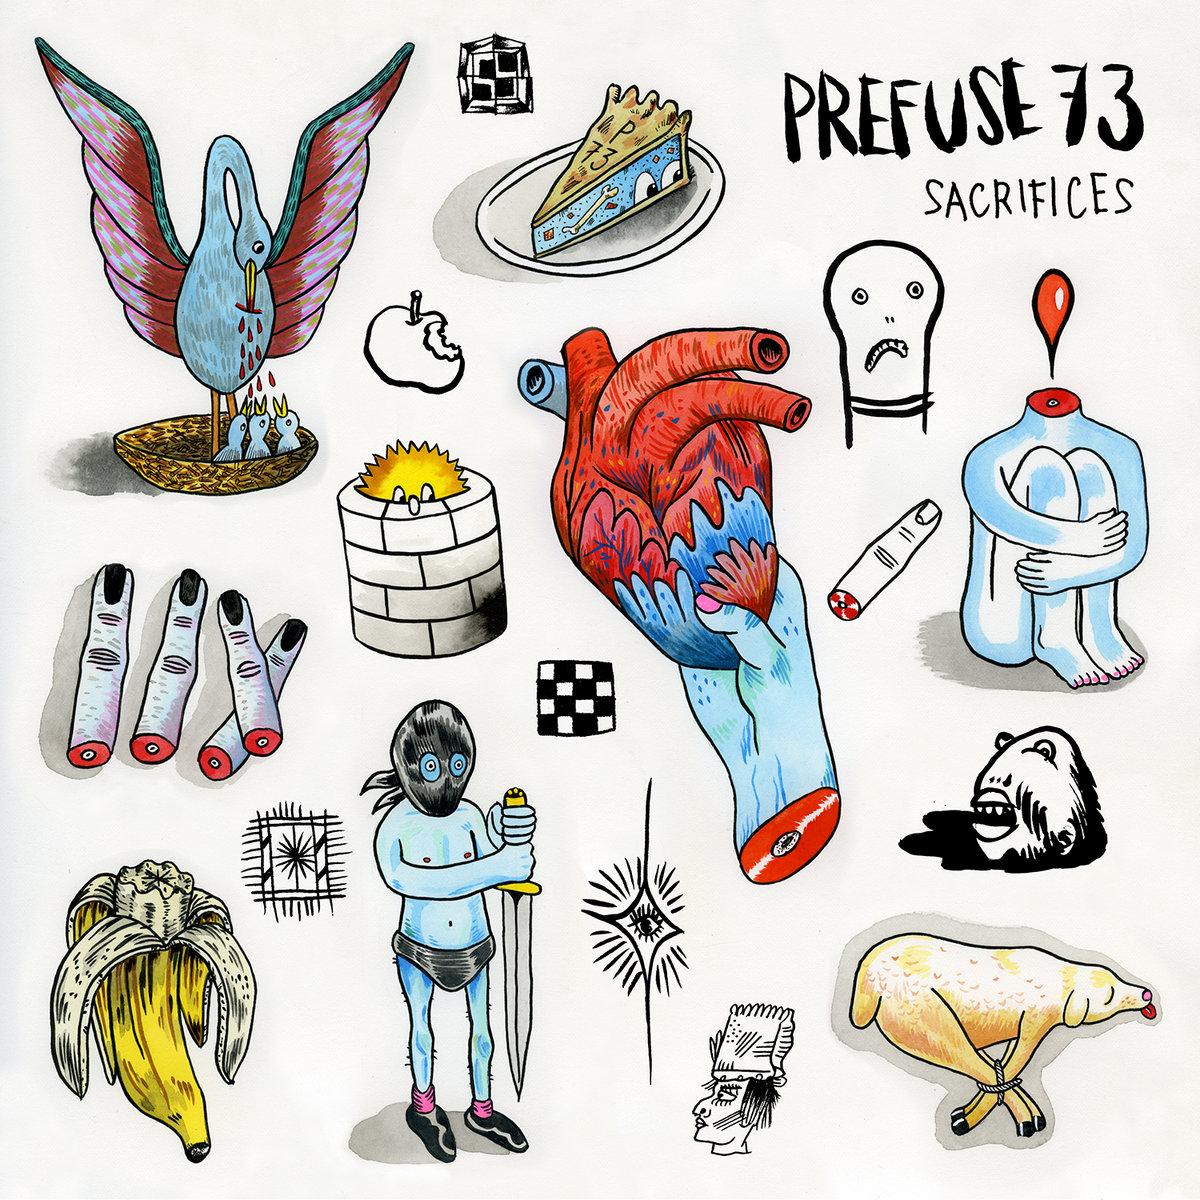 by Prefuse 73